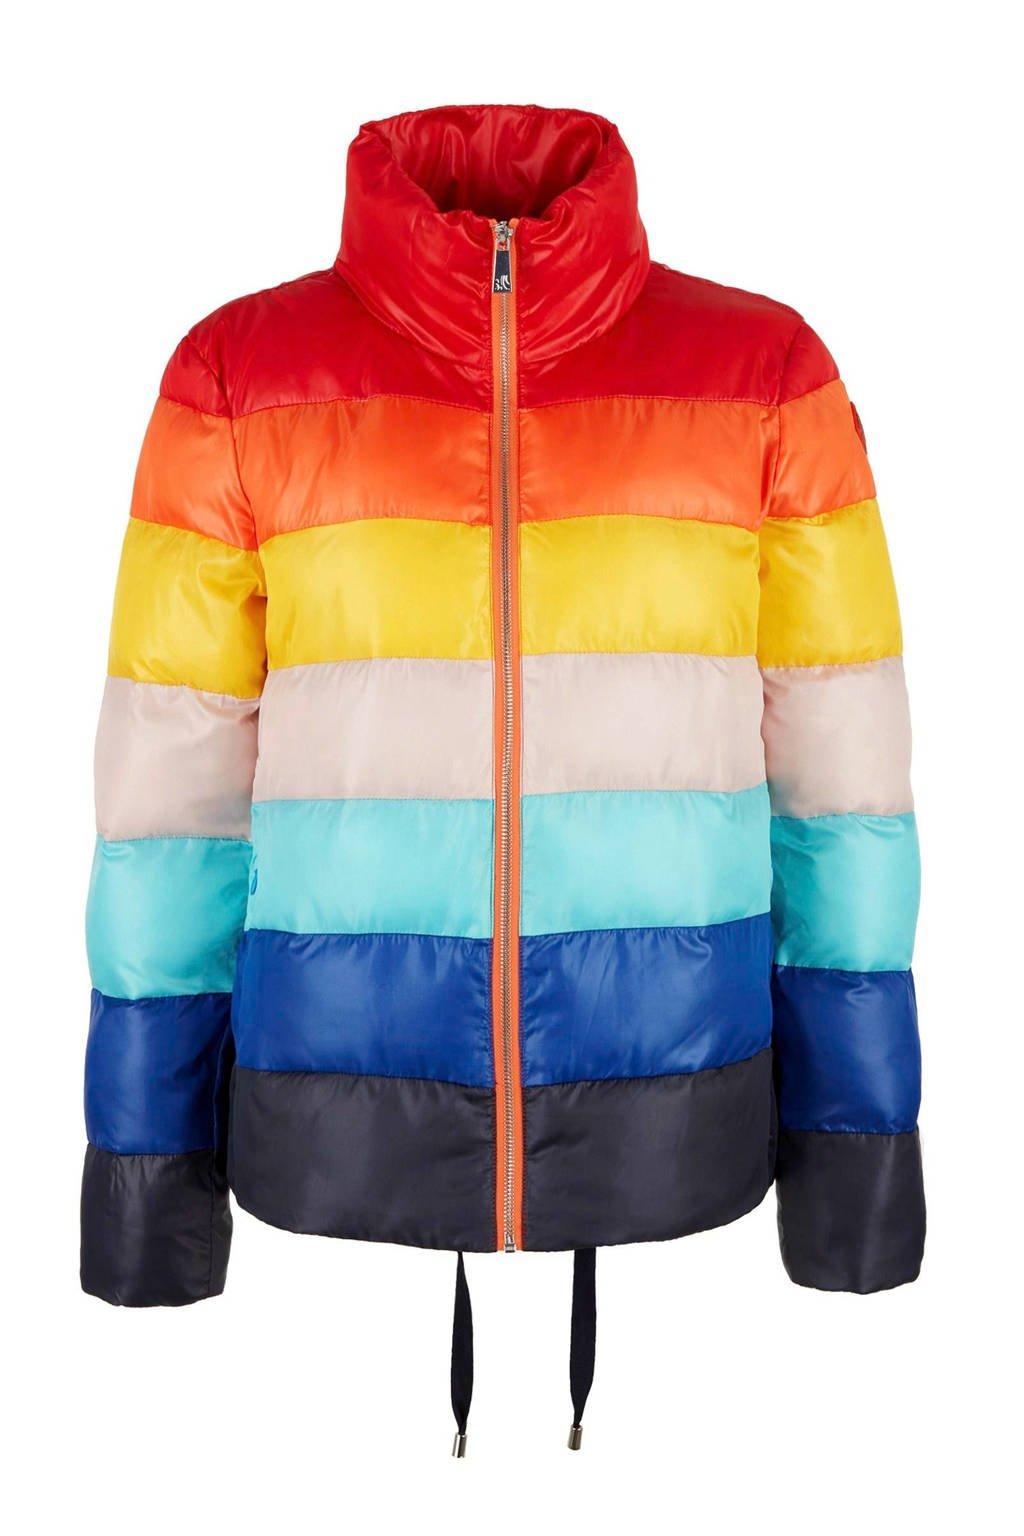 s.Oliver gestreepte jas multicolor, Rood/blauw/geel/oranje